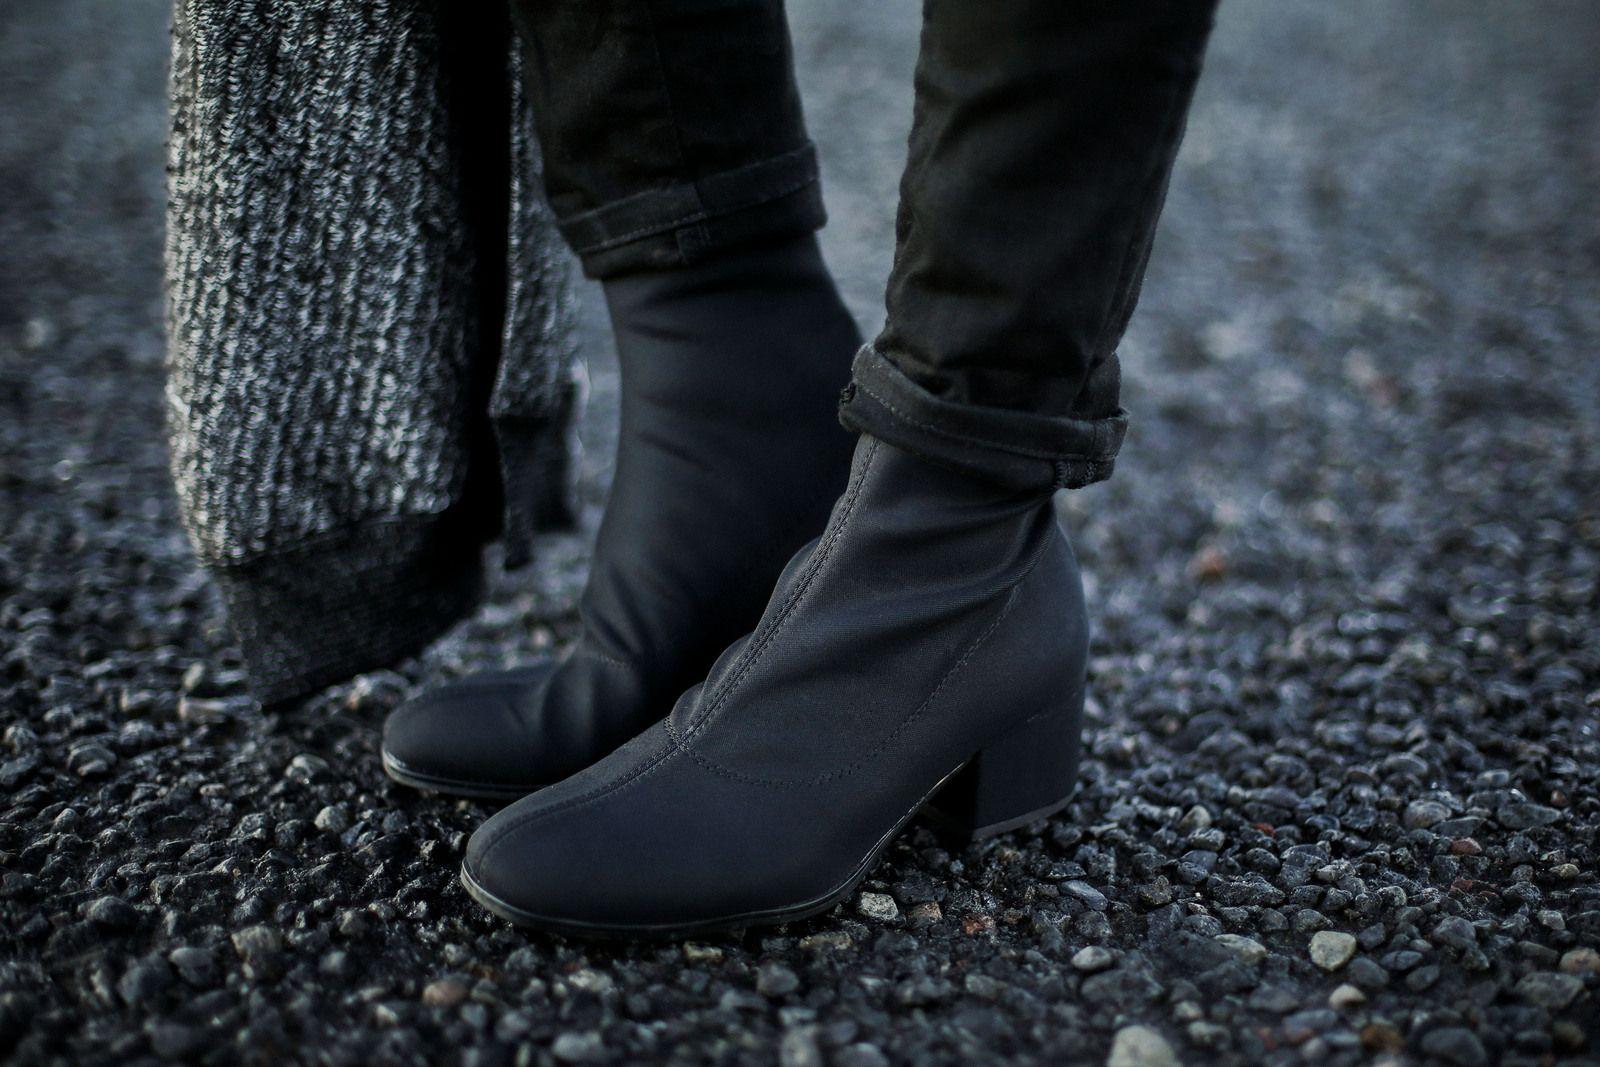 56cd911da6a Vagabond - Daisy ankle | Walk this way | Vagabond boots, Boots, Mid ...